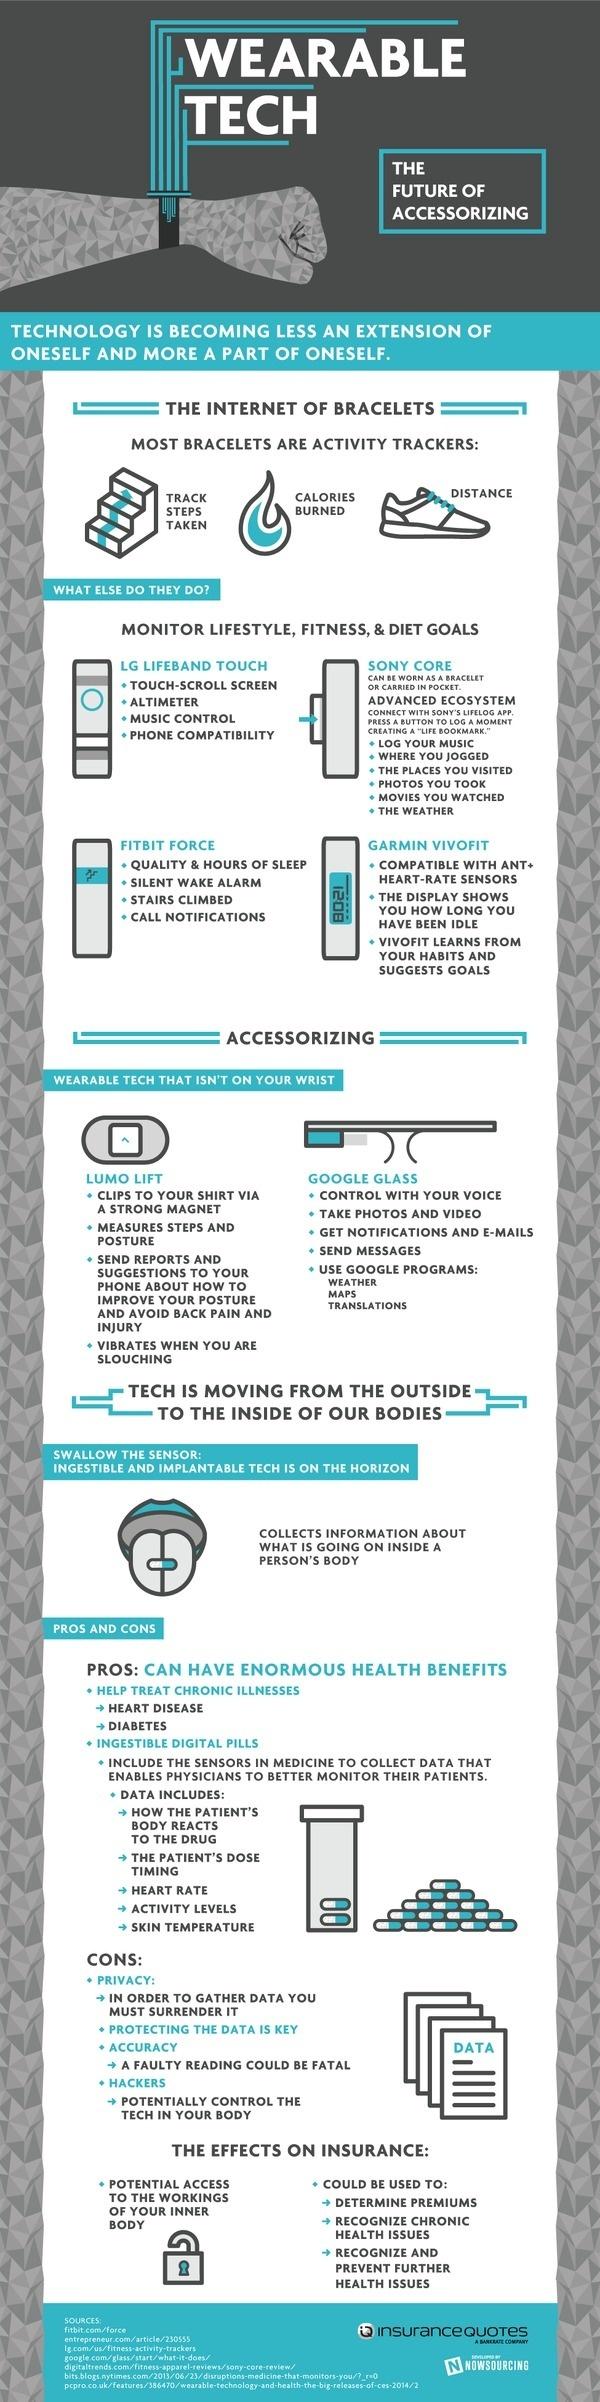 Wearable Tech #tech #infographic